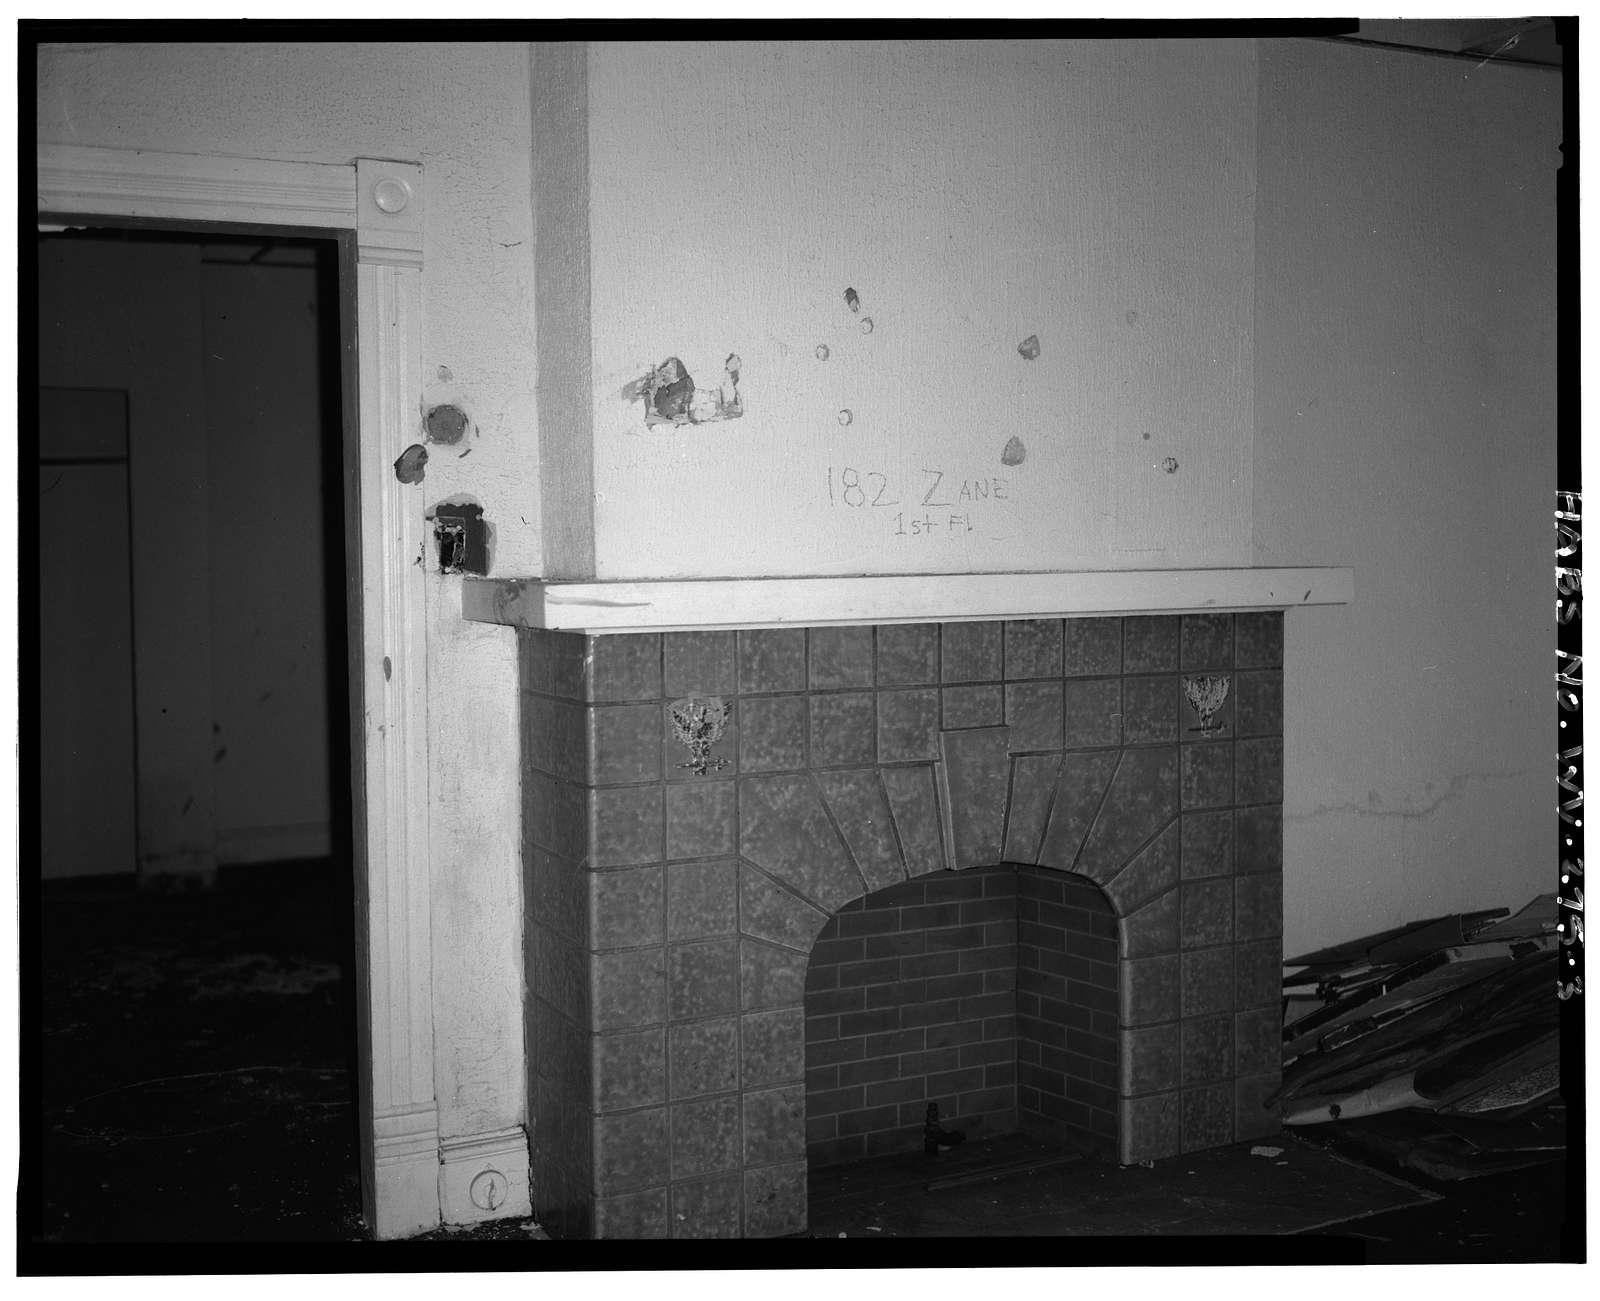 182 Zane Street (House), Wheeling, Ohio County, WV